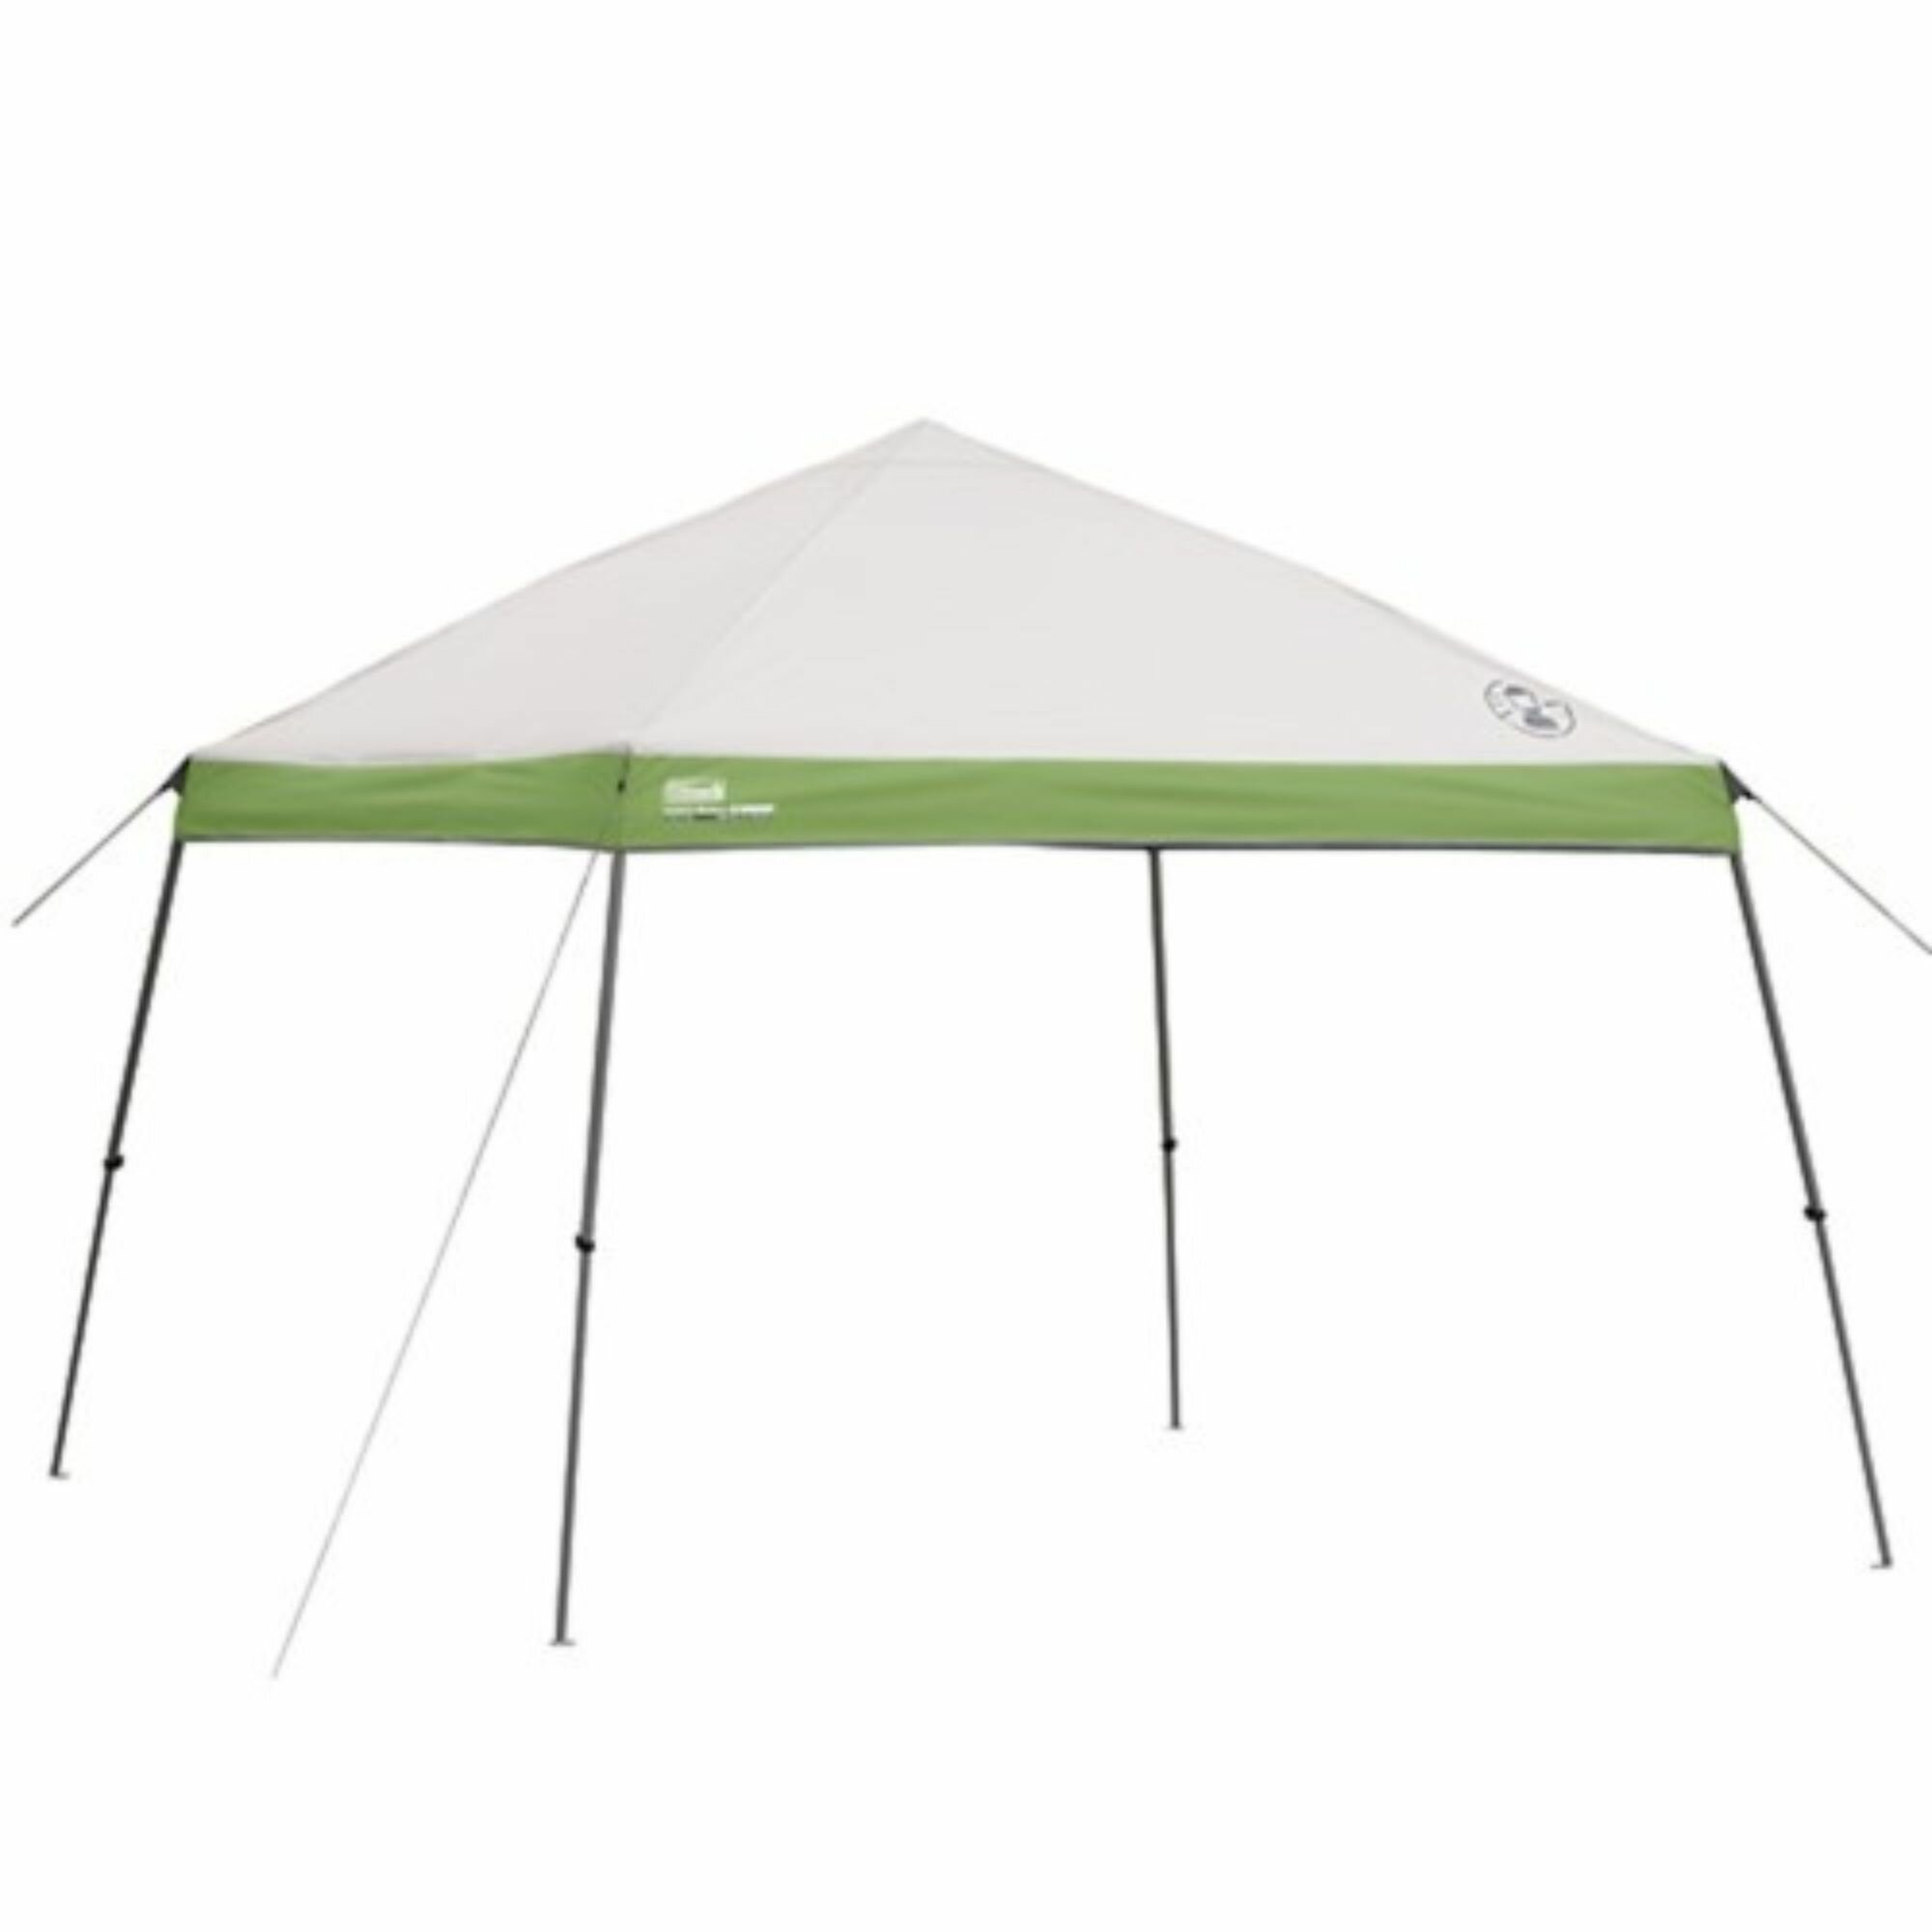 san francisco dcaf1 6c907 10 Ft. W x 10 Ft. D Steel Pop-Up Canopy